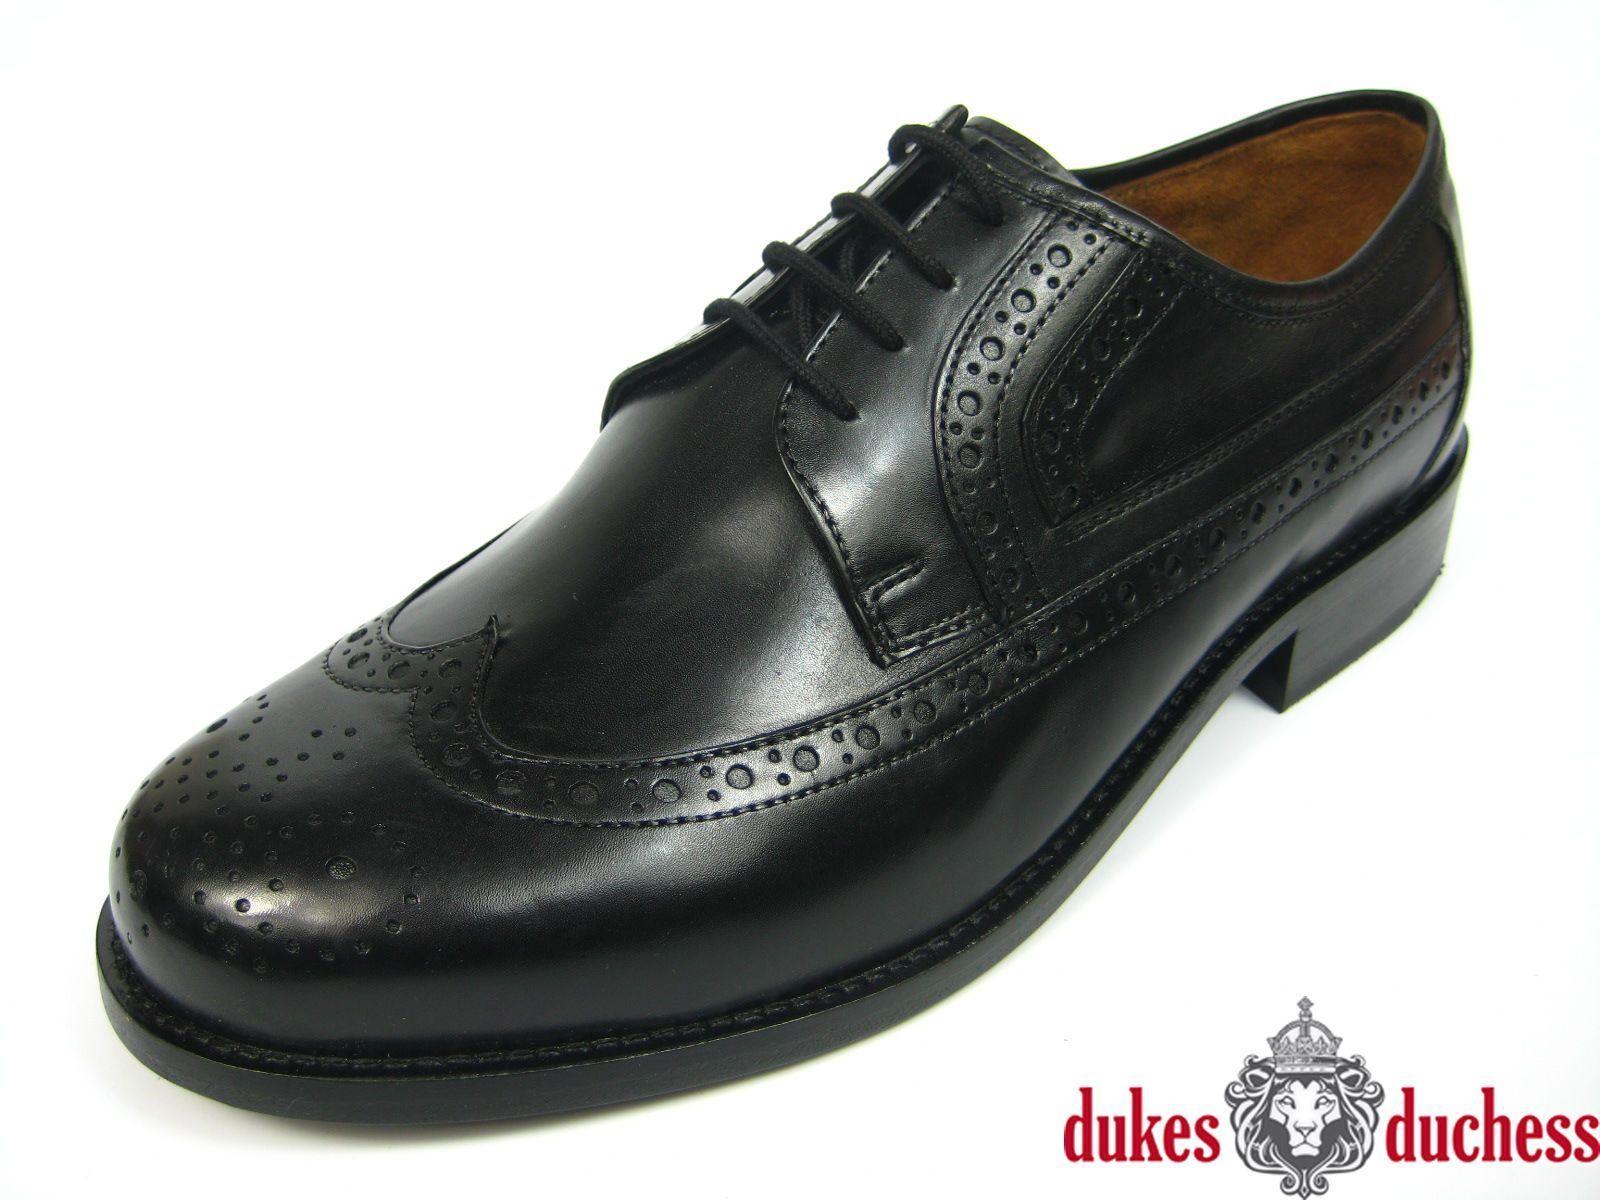 Business Schuhe Männer Braun Derby Budapester Buda